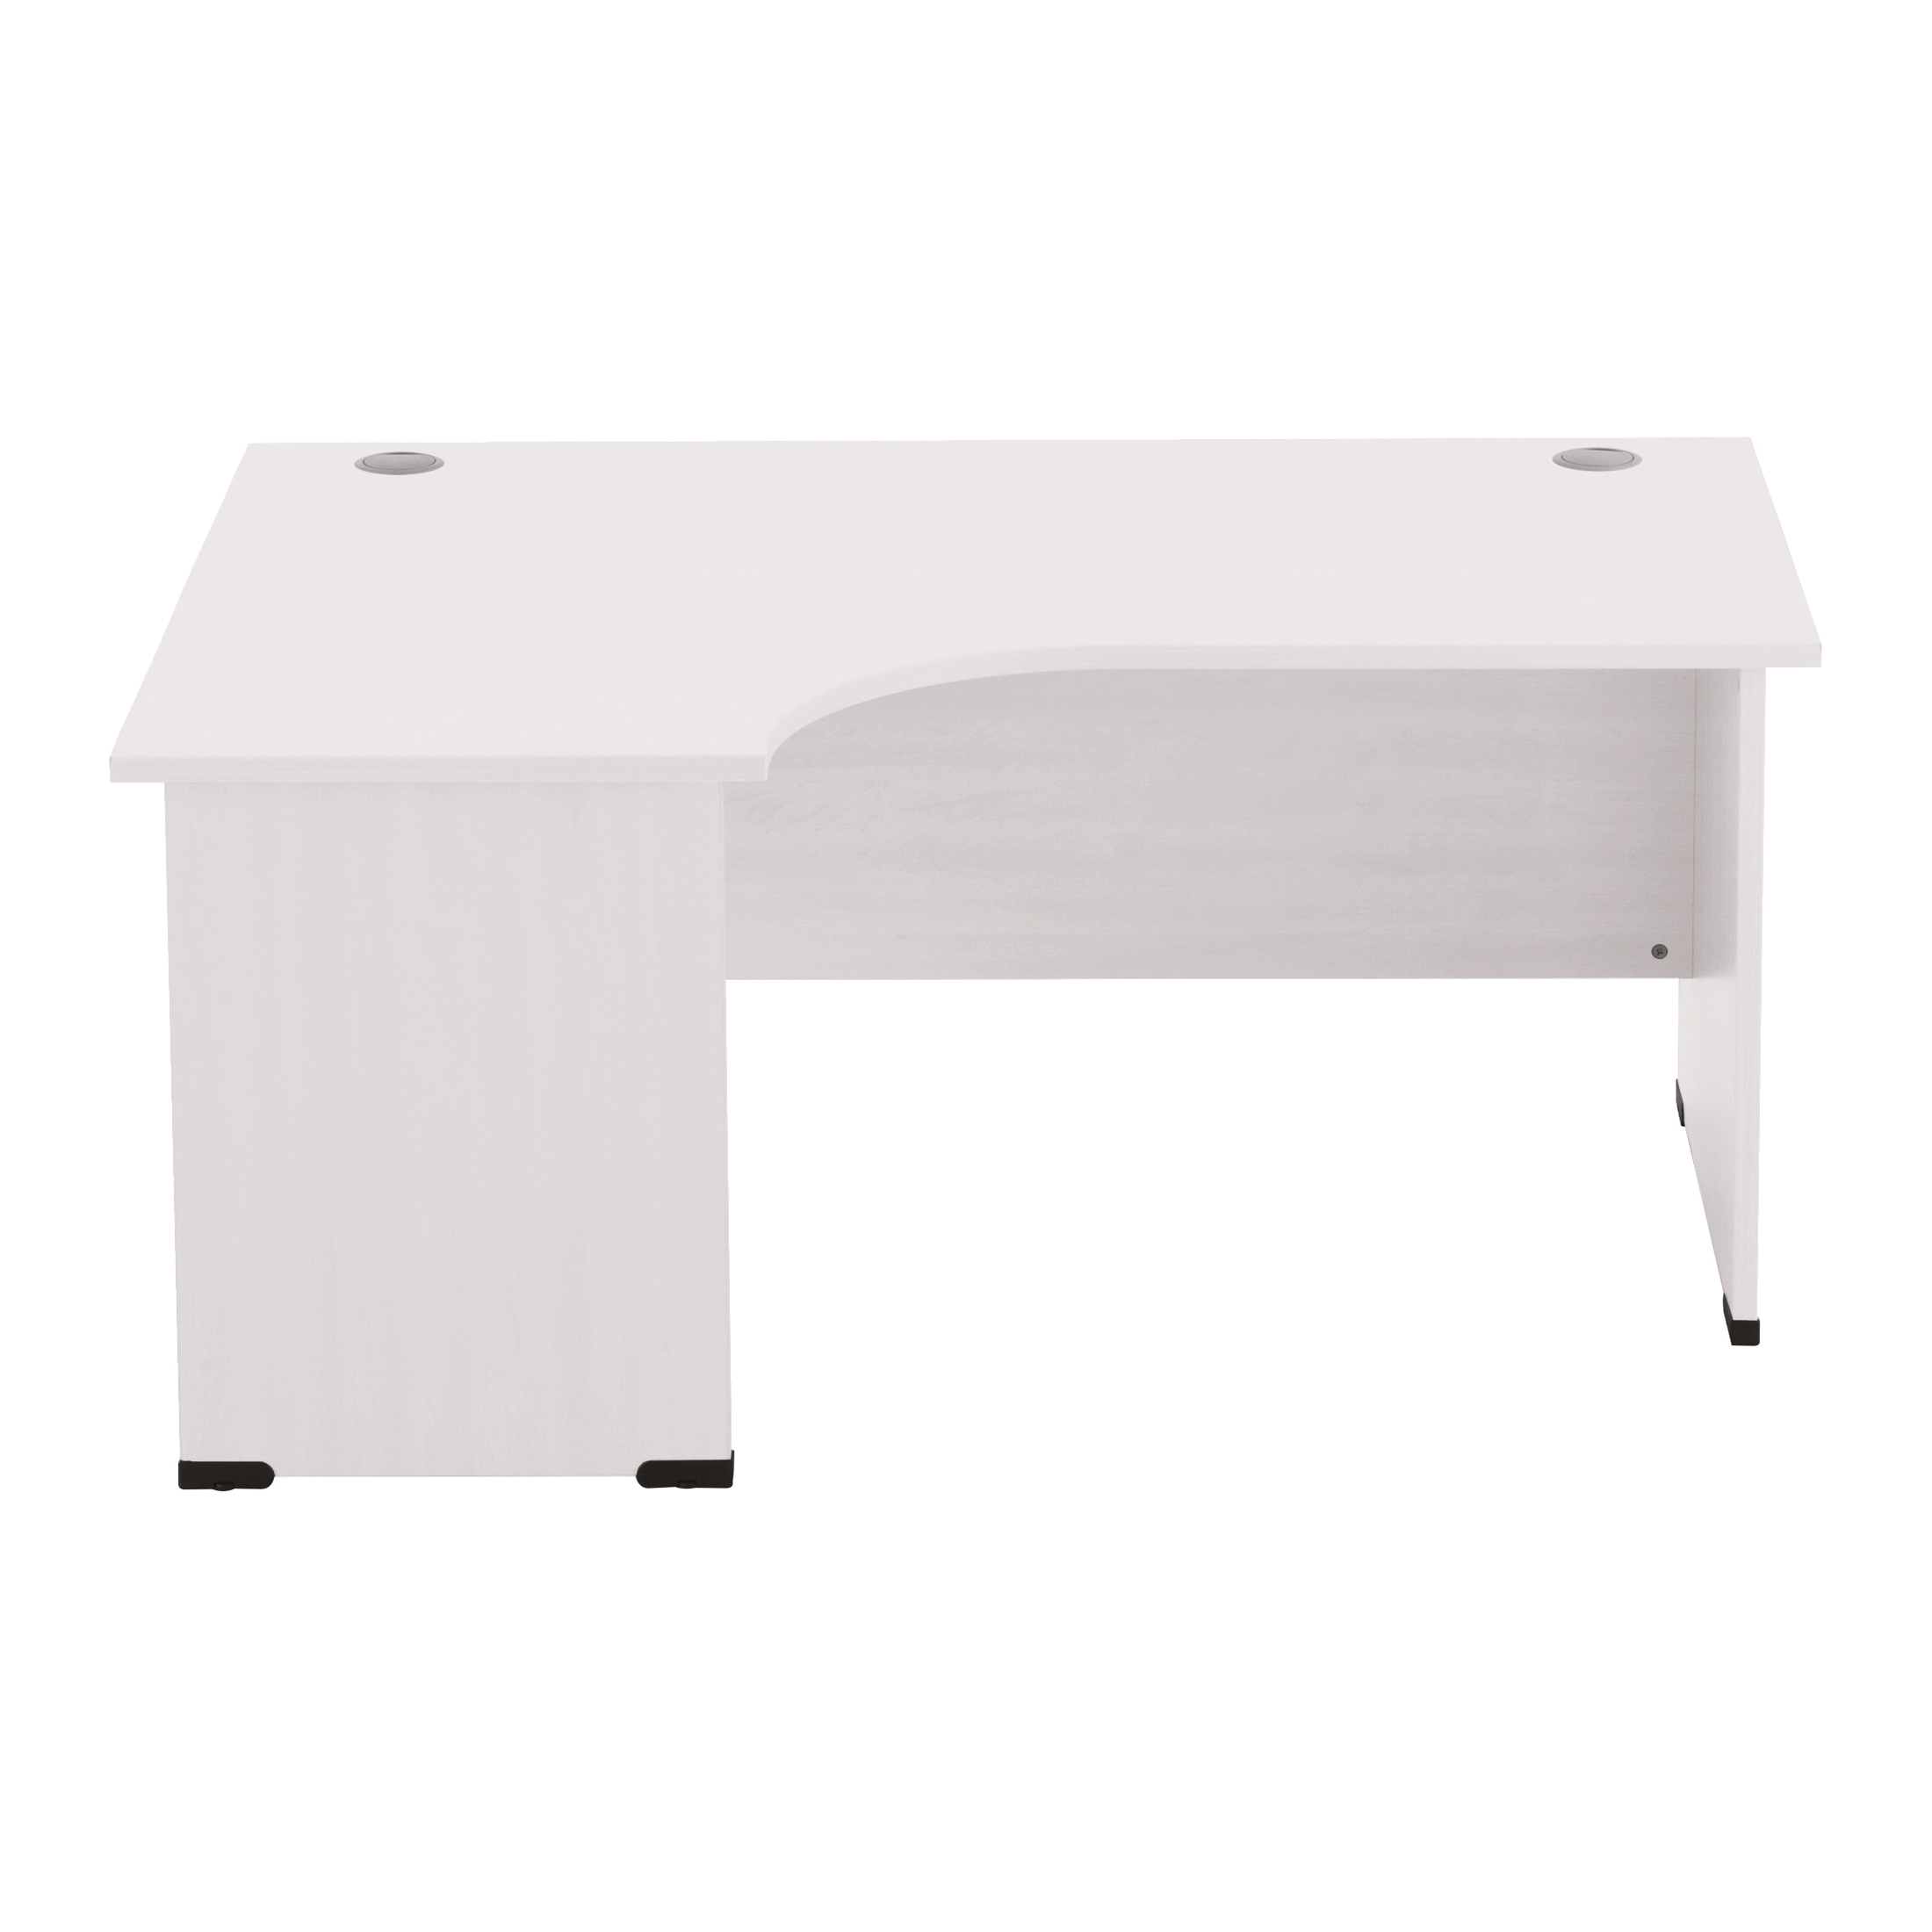 Sonix Radial Desk Left Hand Panel End Legs 1600/1170mm Polar White Ref w9410lwh